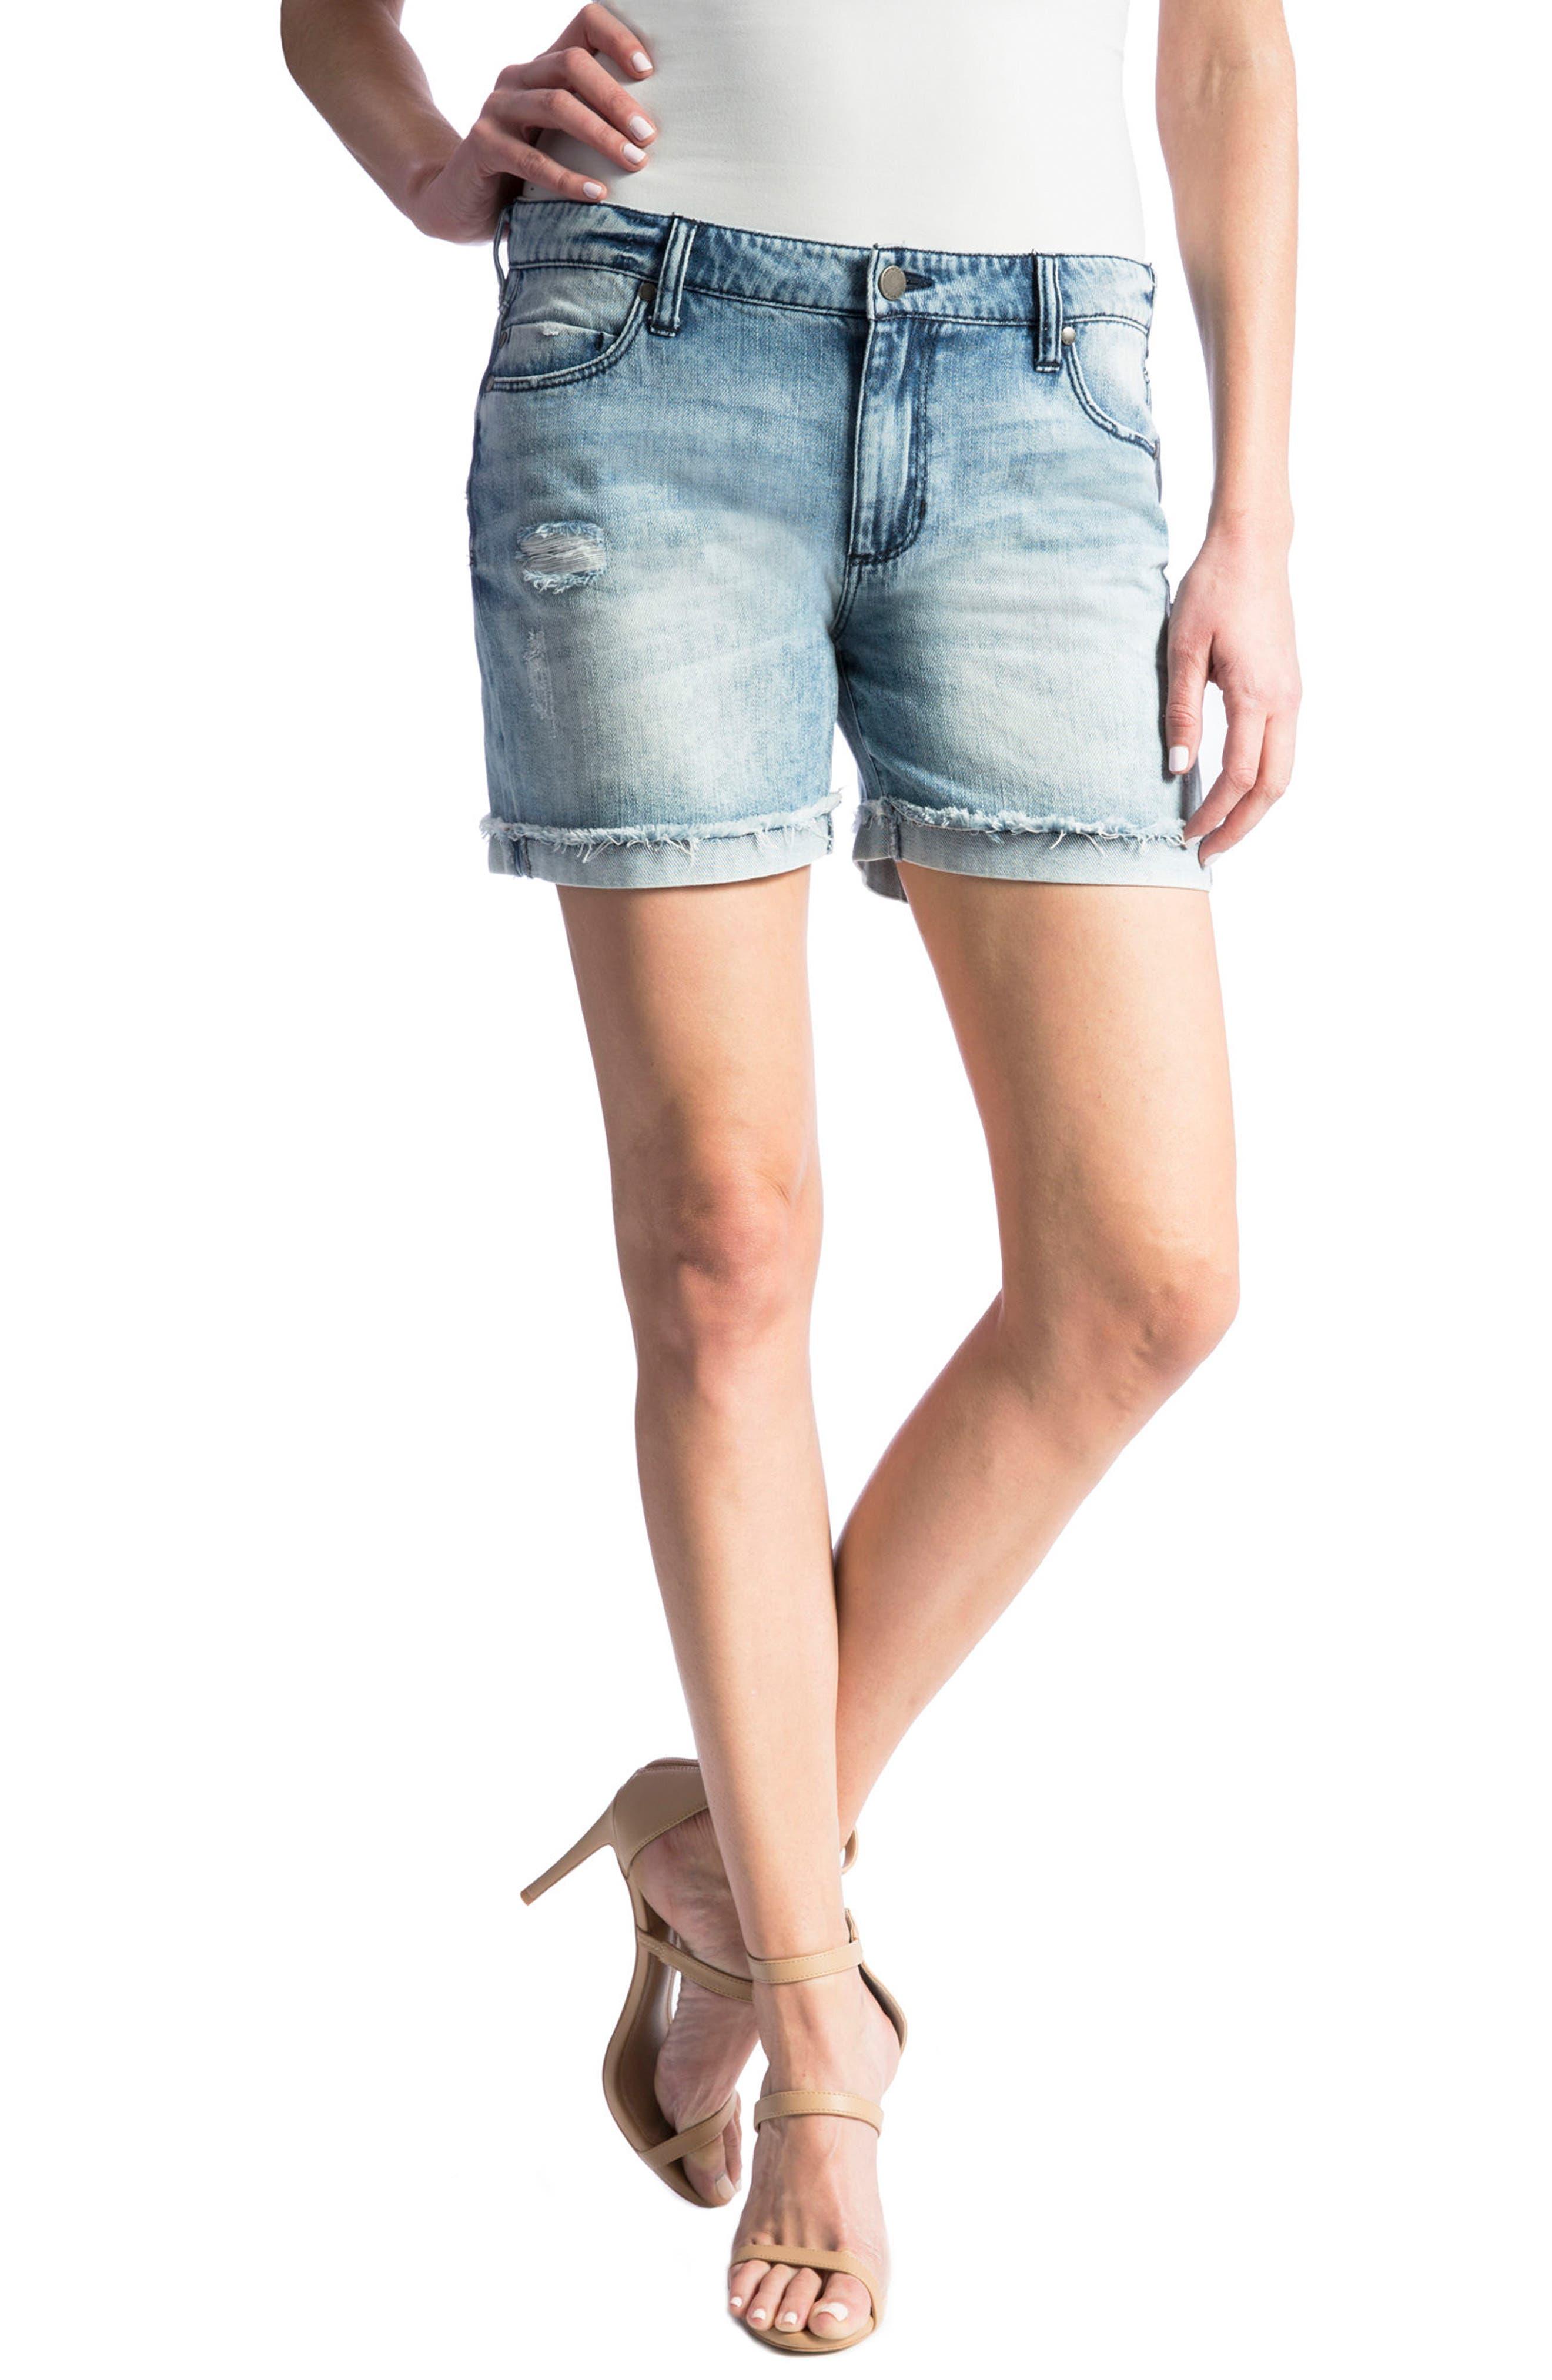 Liverpool Jeans Company Elliot Denim Boyfriend Shorts (Stockton Destruct)